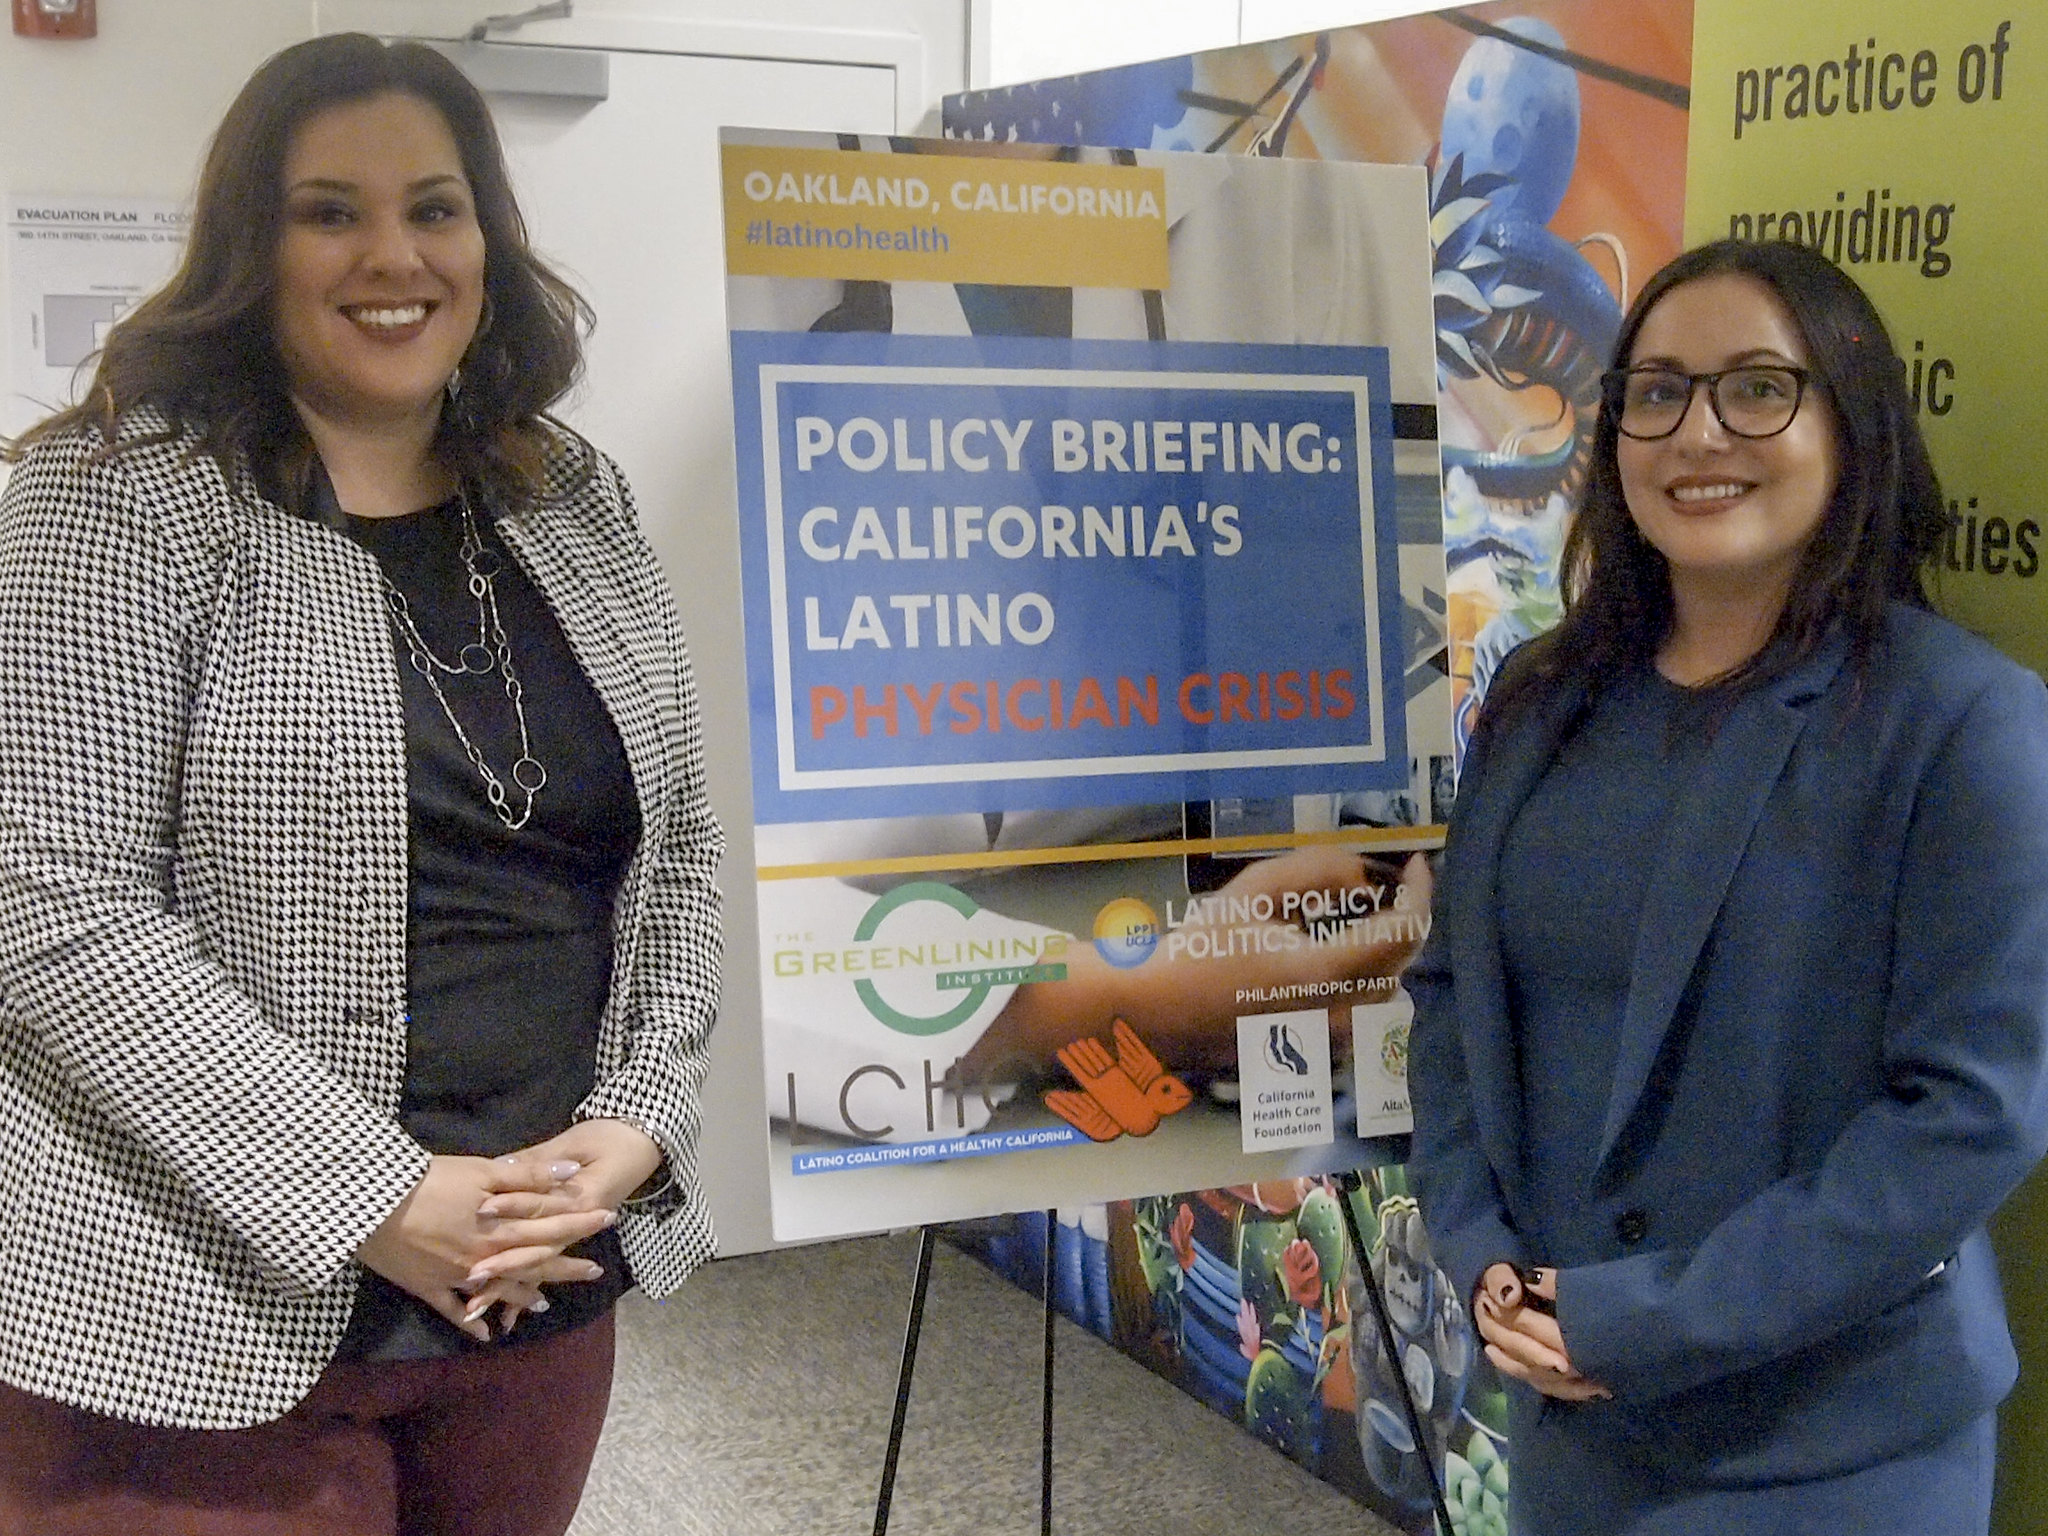 Latino Physician Crisis Policy Briefing